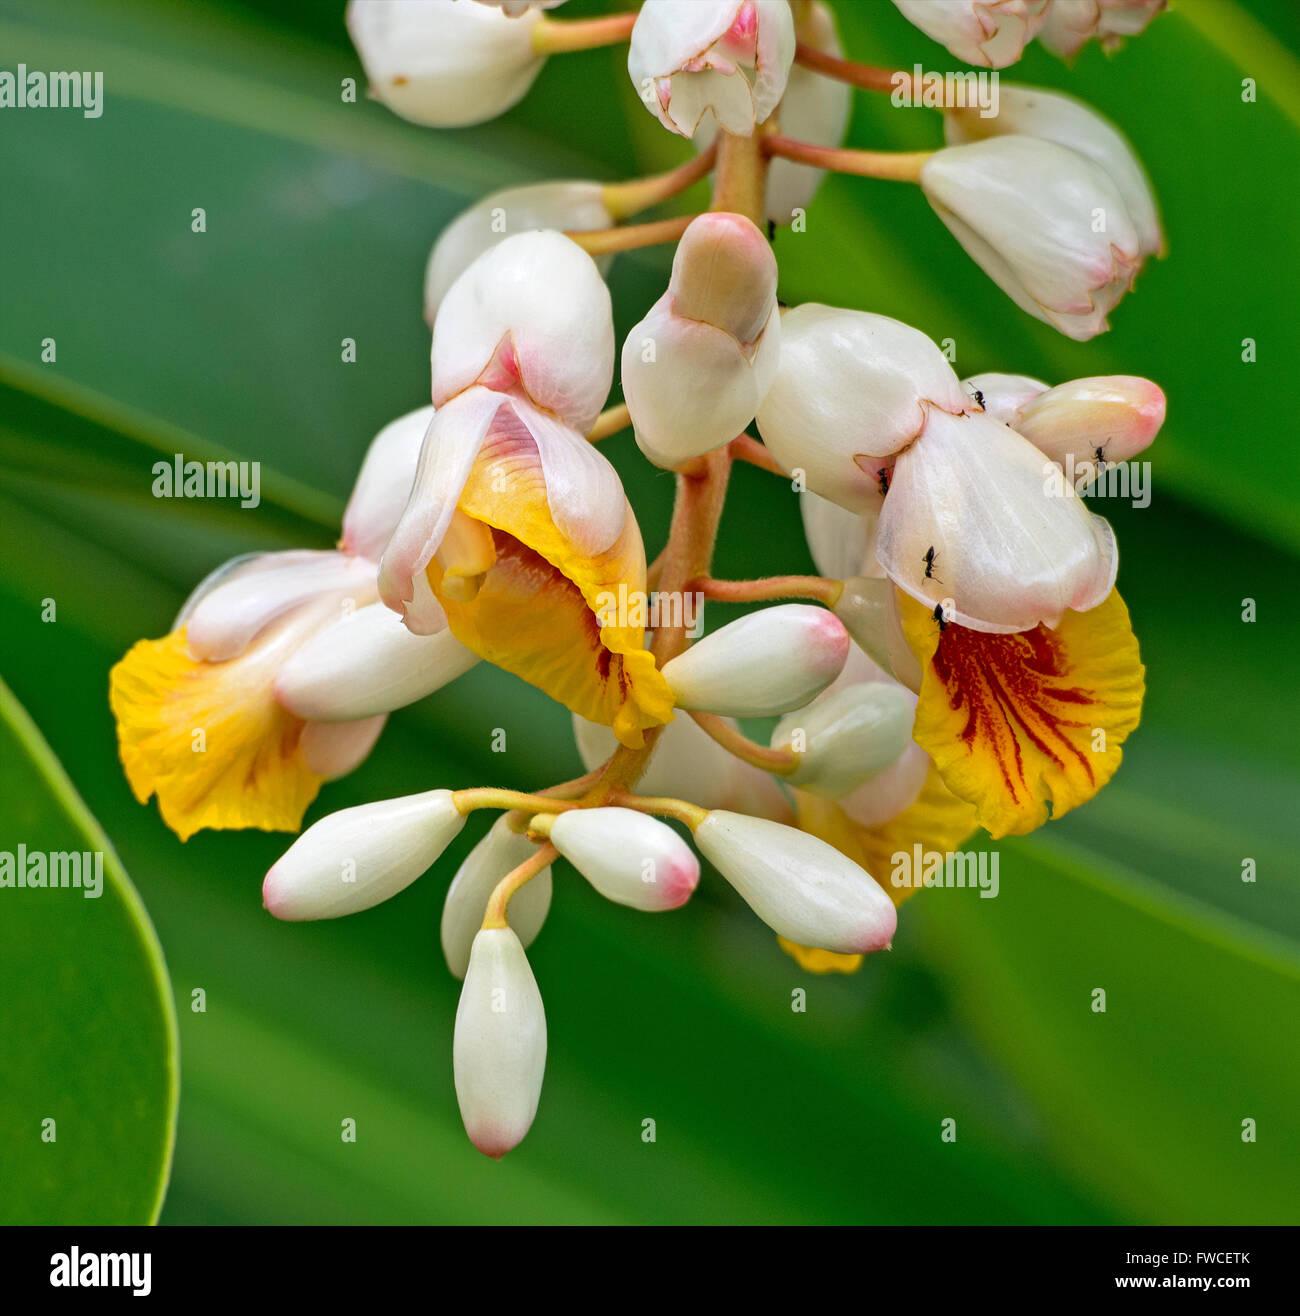 Alpinia zerumbet syn nutans, Shell Ginger, Cardamom Leaf Plant, Cinnamom Ginger - Stock Image